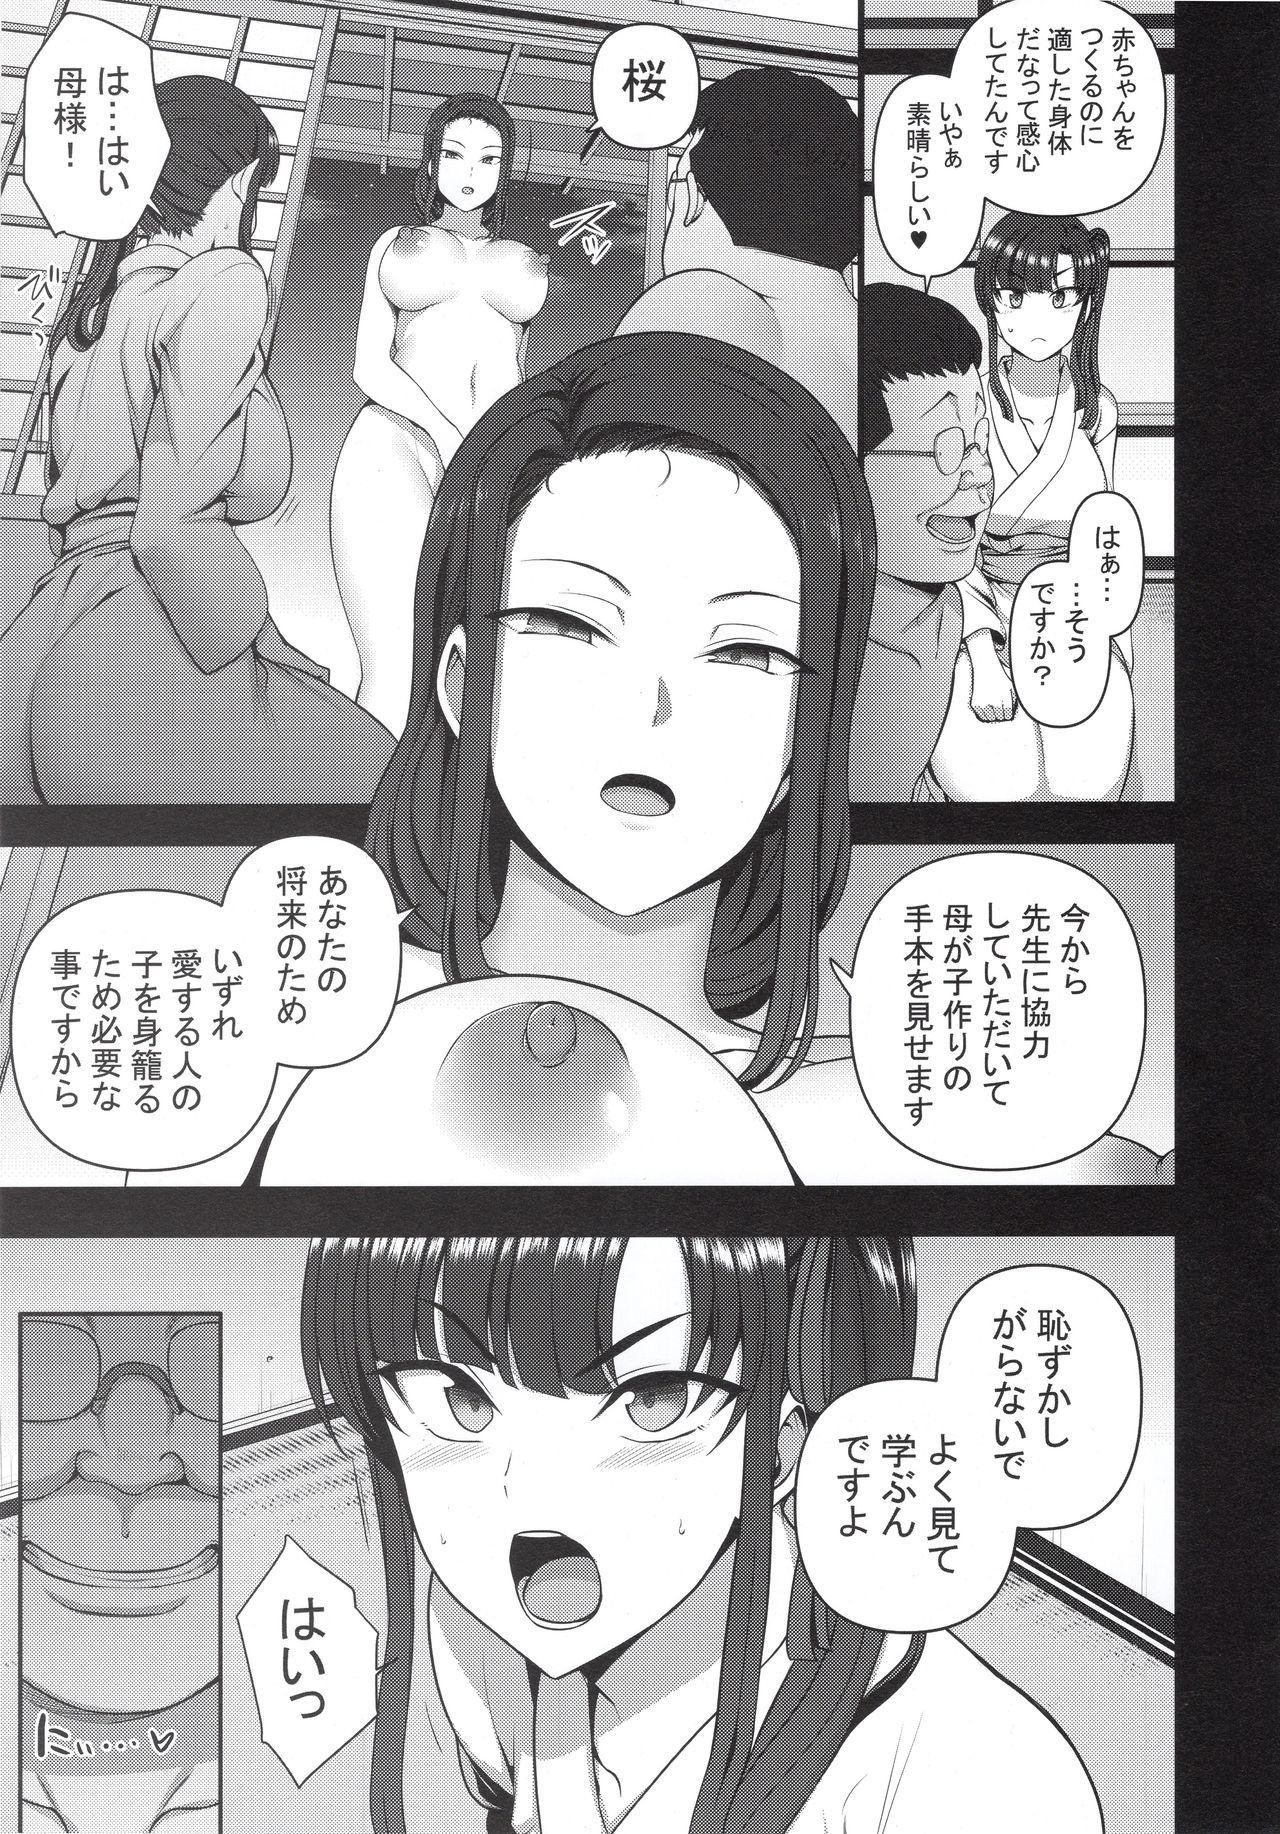 Saimin Seishidou 4: Ninshin Taiken Shidou 41